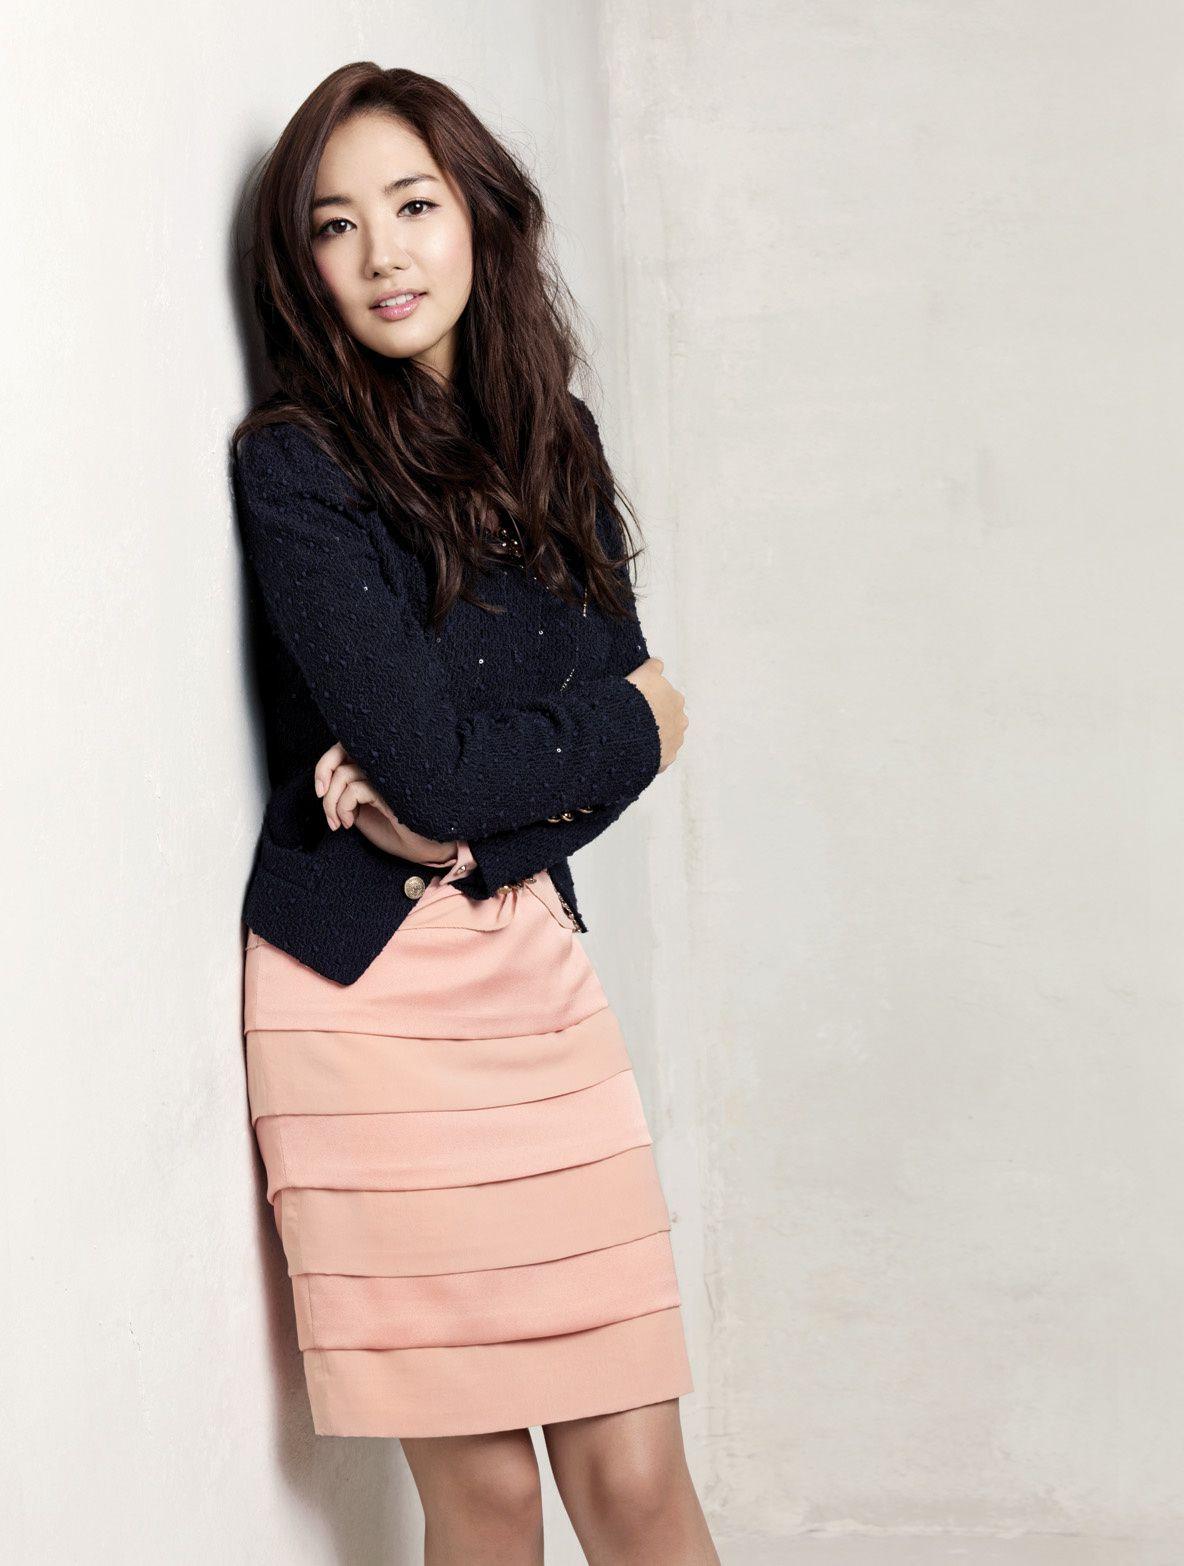 Park Min Young K Pop Livepolska